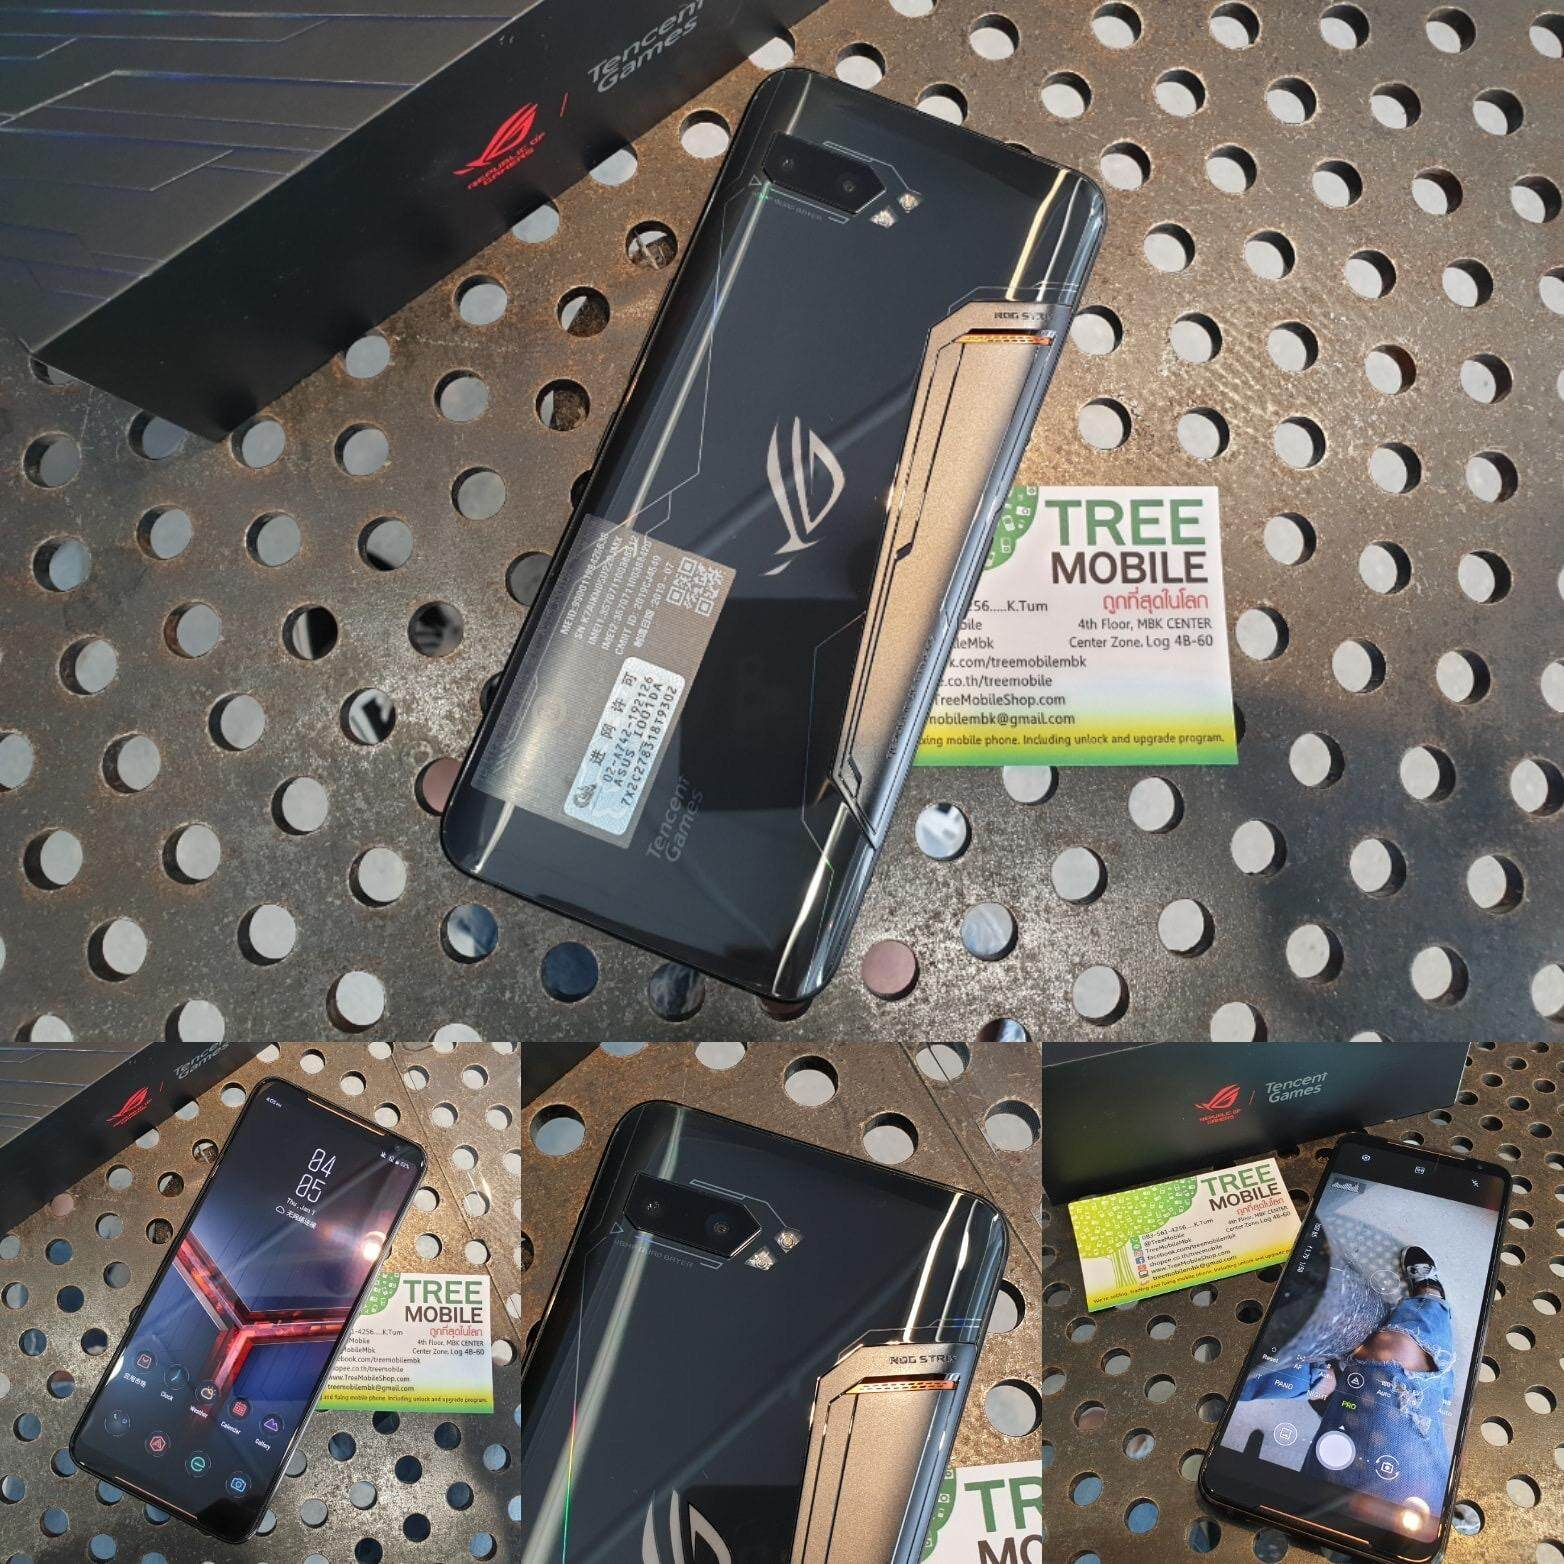 ASUS ROG Phone 2 128GB /512GB /ร้าน TreeMobile TreeMobileMbk